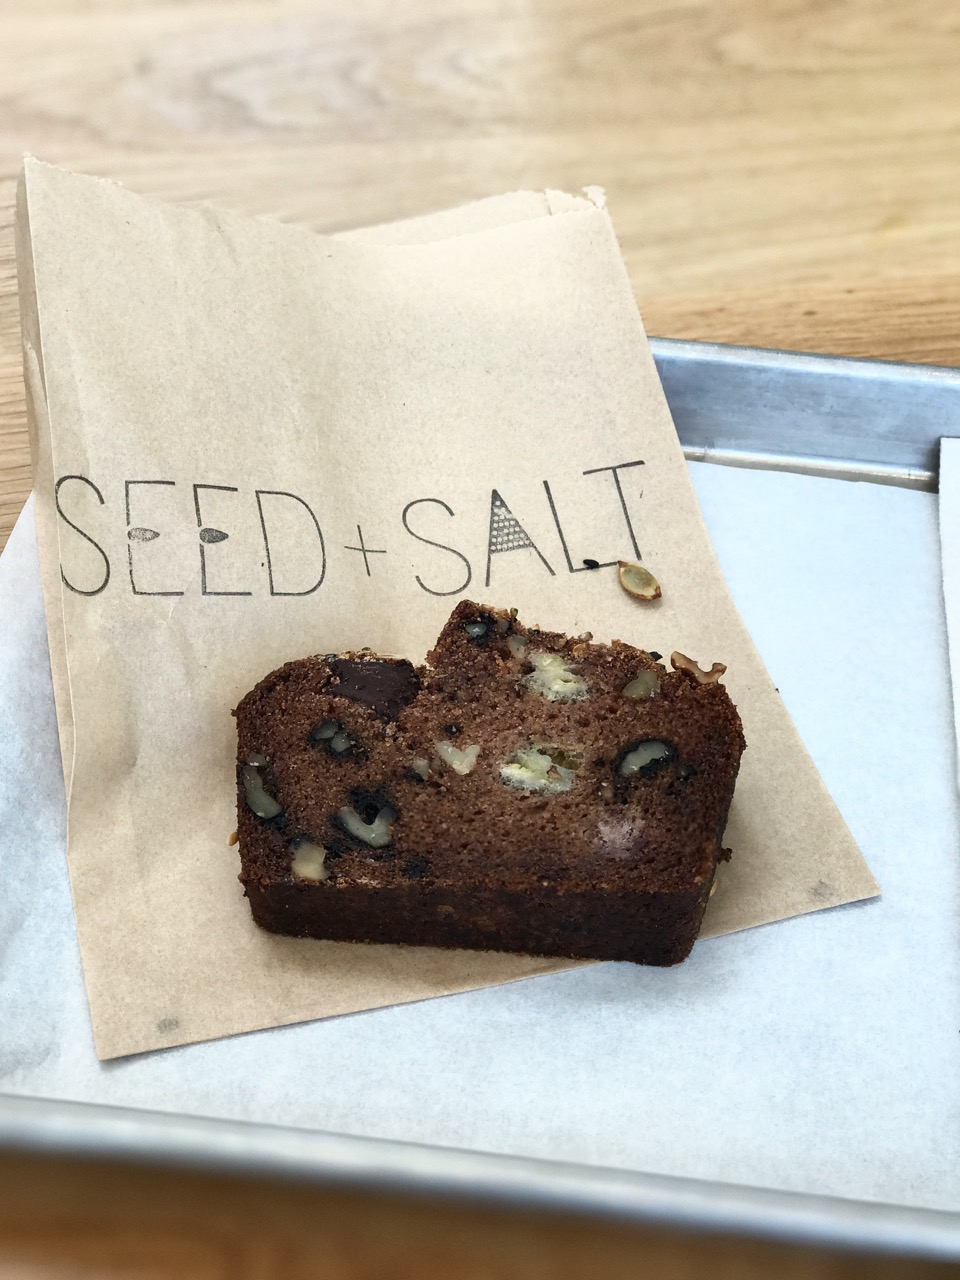 Vegan chocolate, walnut & banana bread from Seed + Salt, San Francisco.